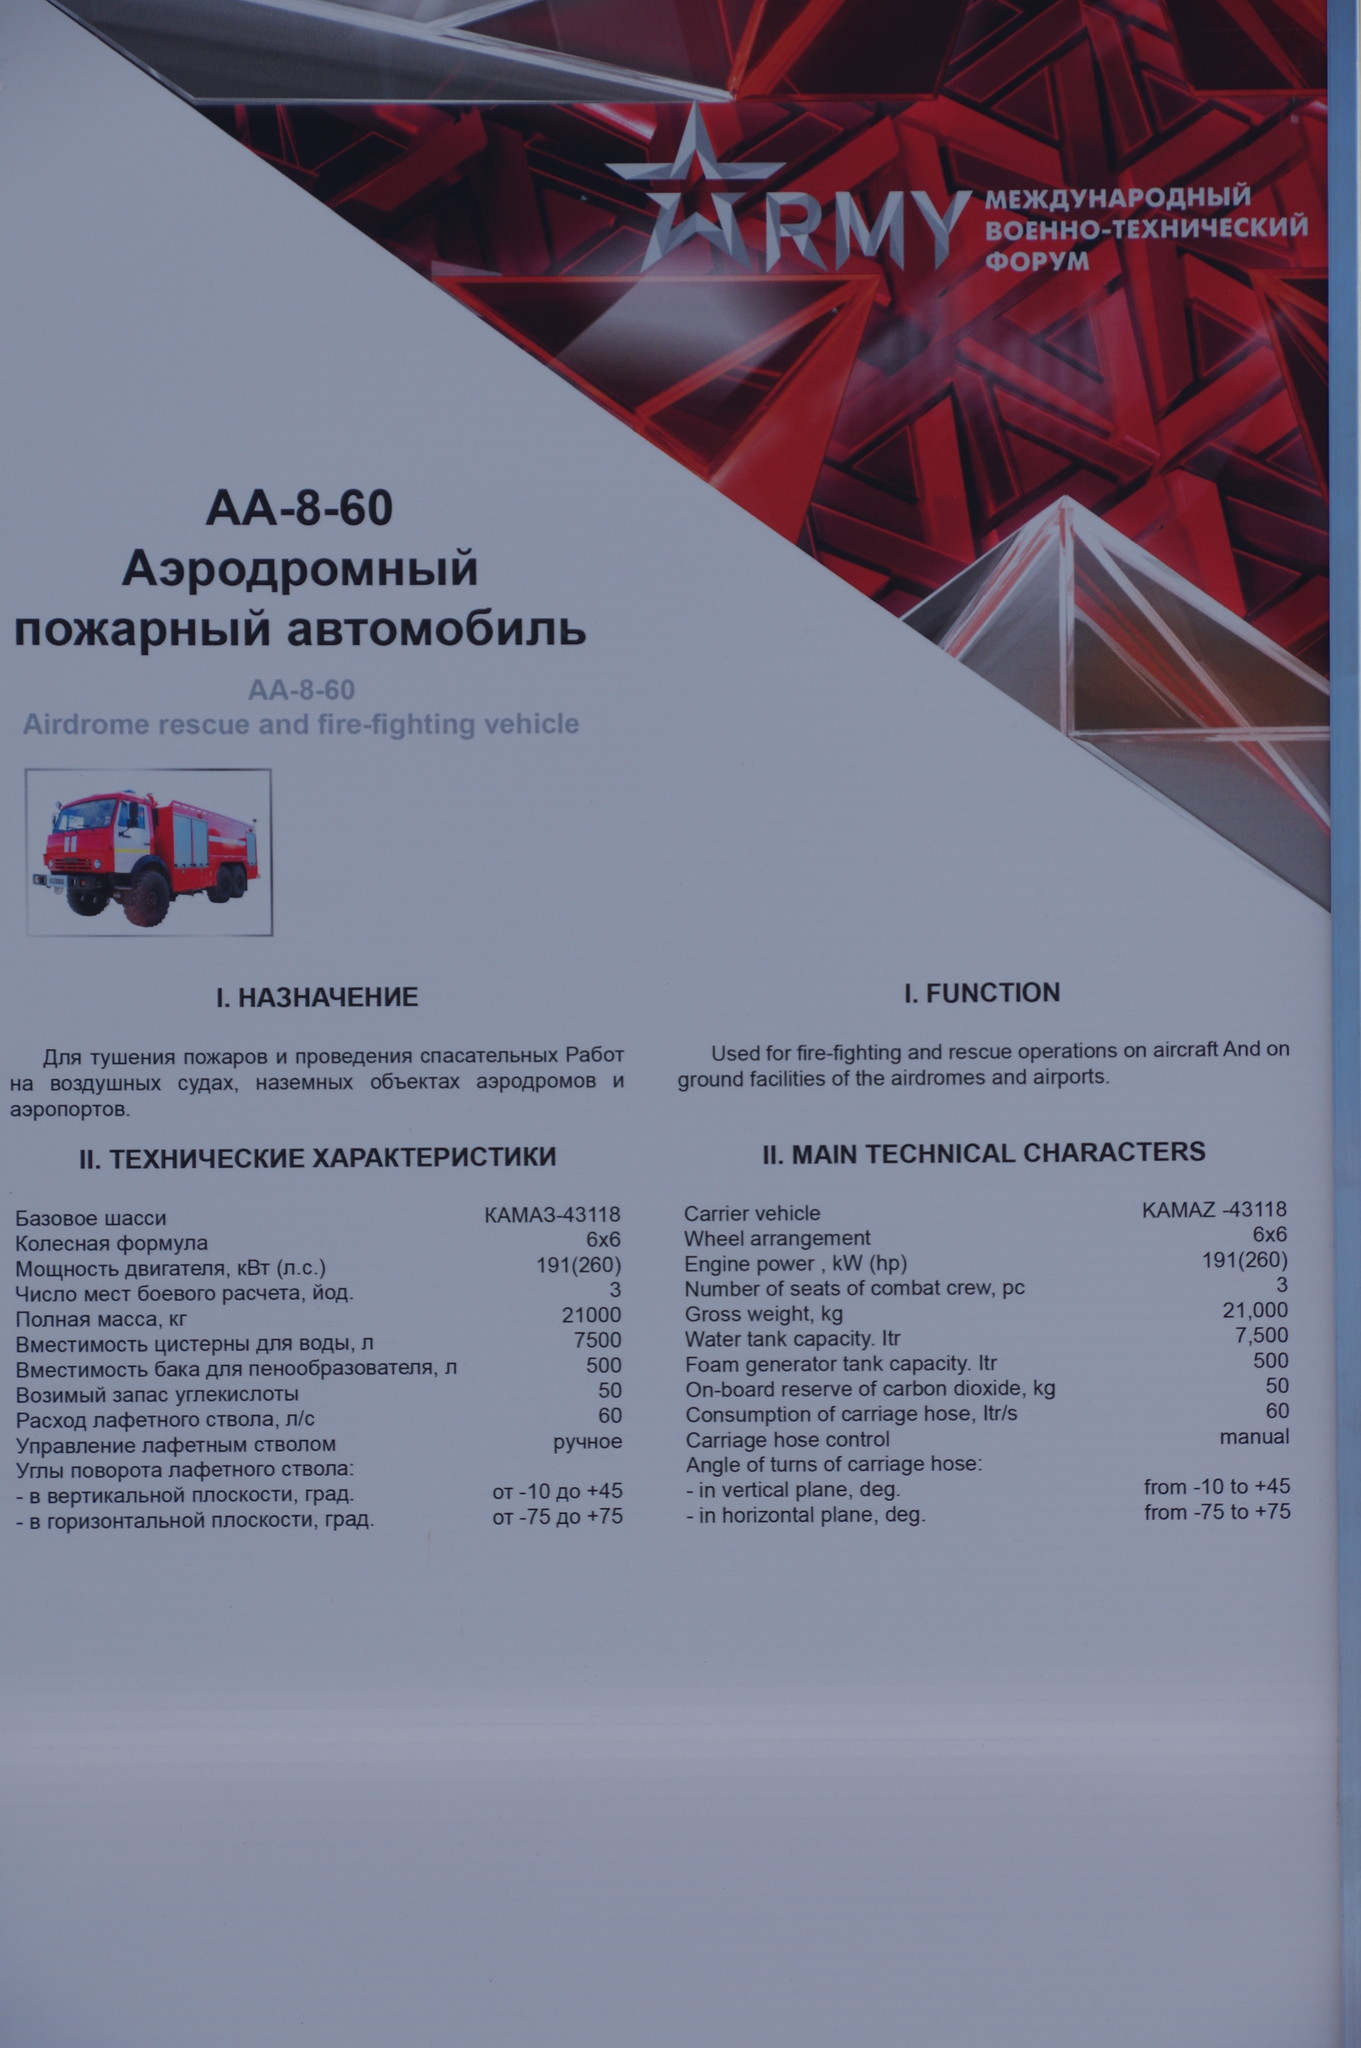 Аэродромный пожарный автомобиль АА-8.0-60 на базе КамАЗ-43118